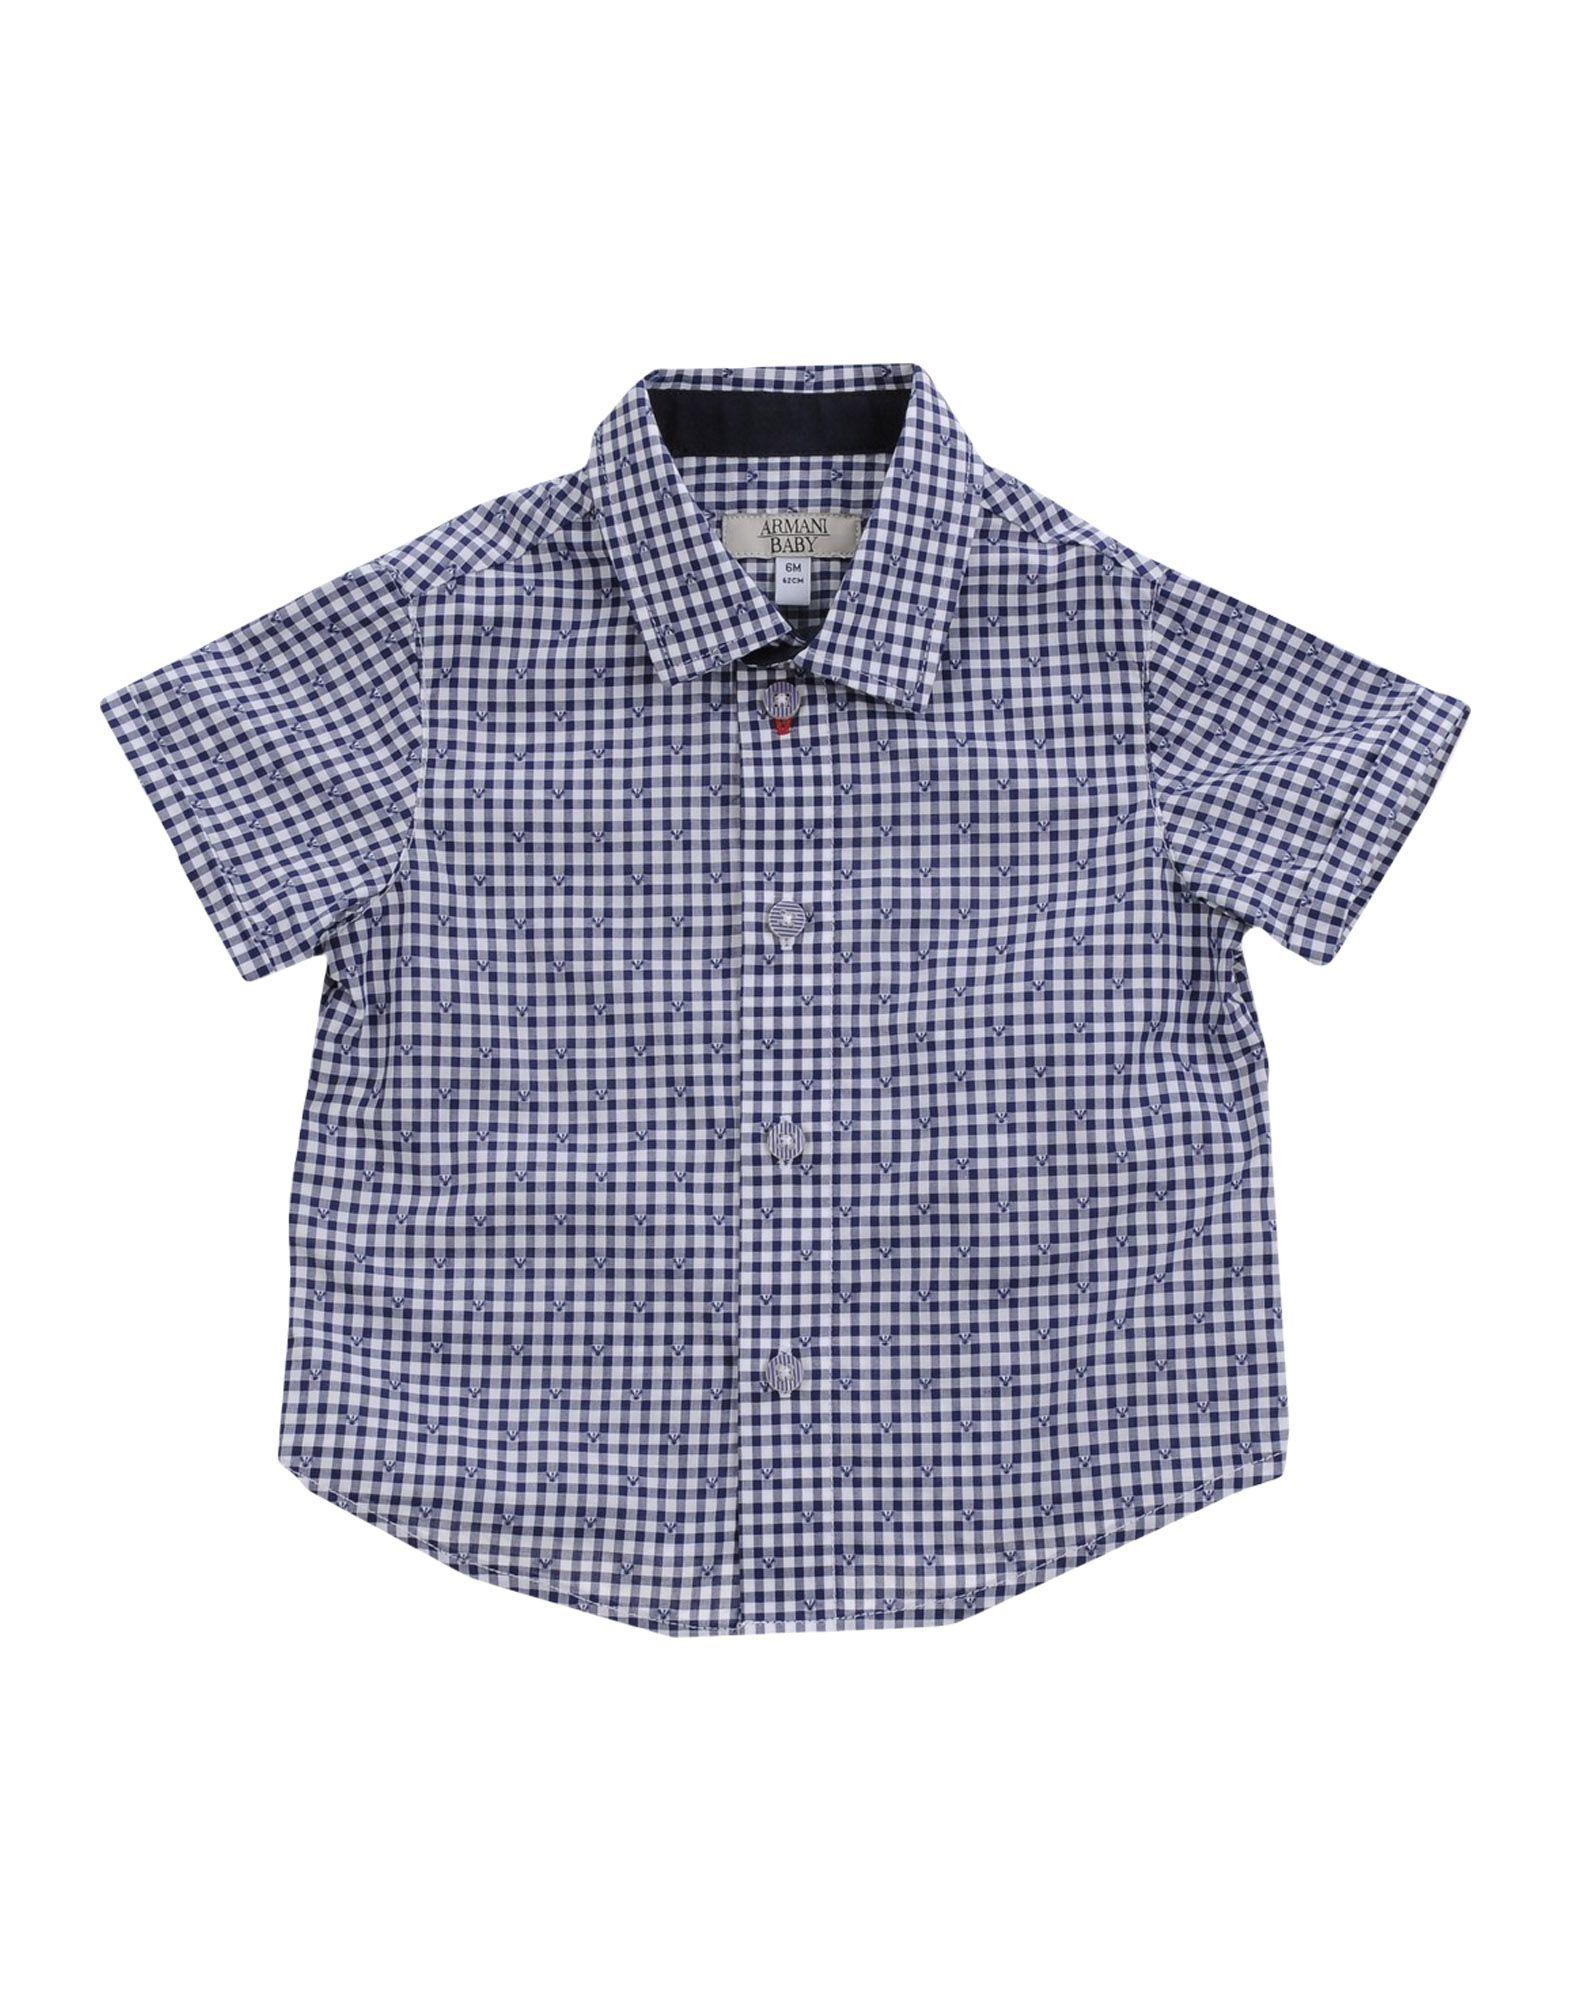 ARMANI JUNIOR シャツ ブルー